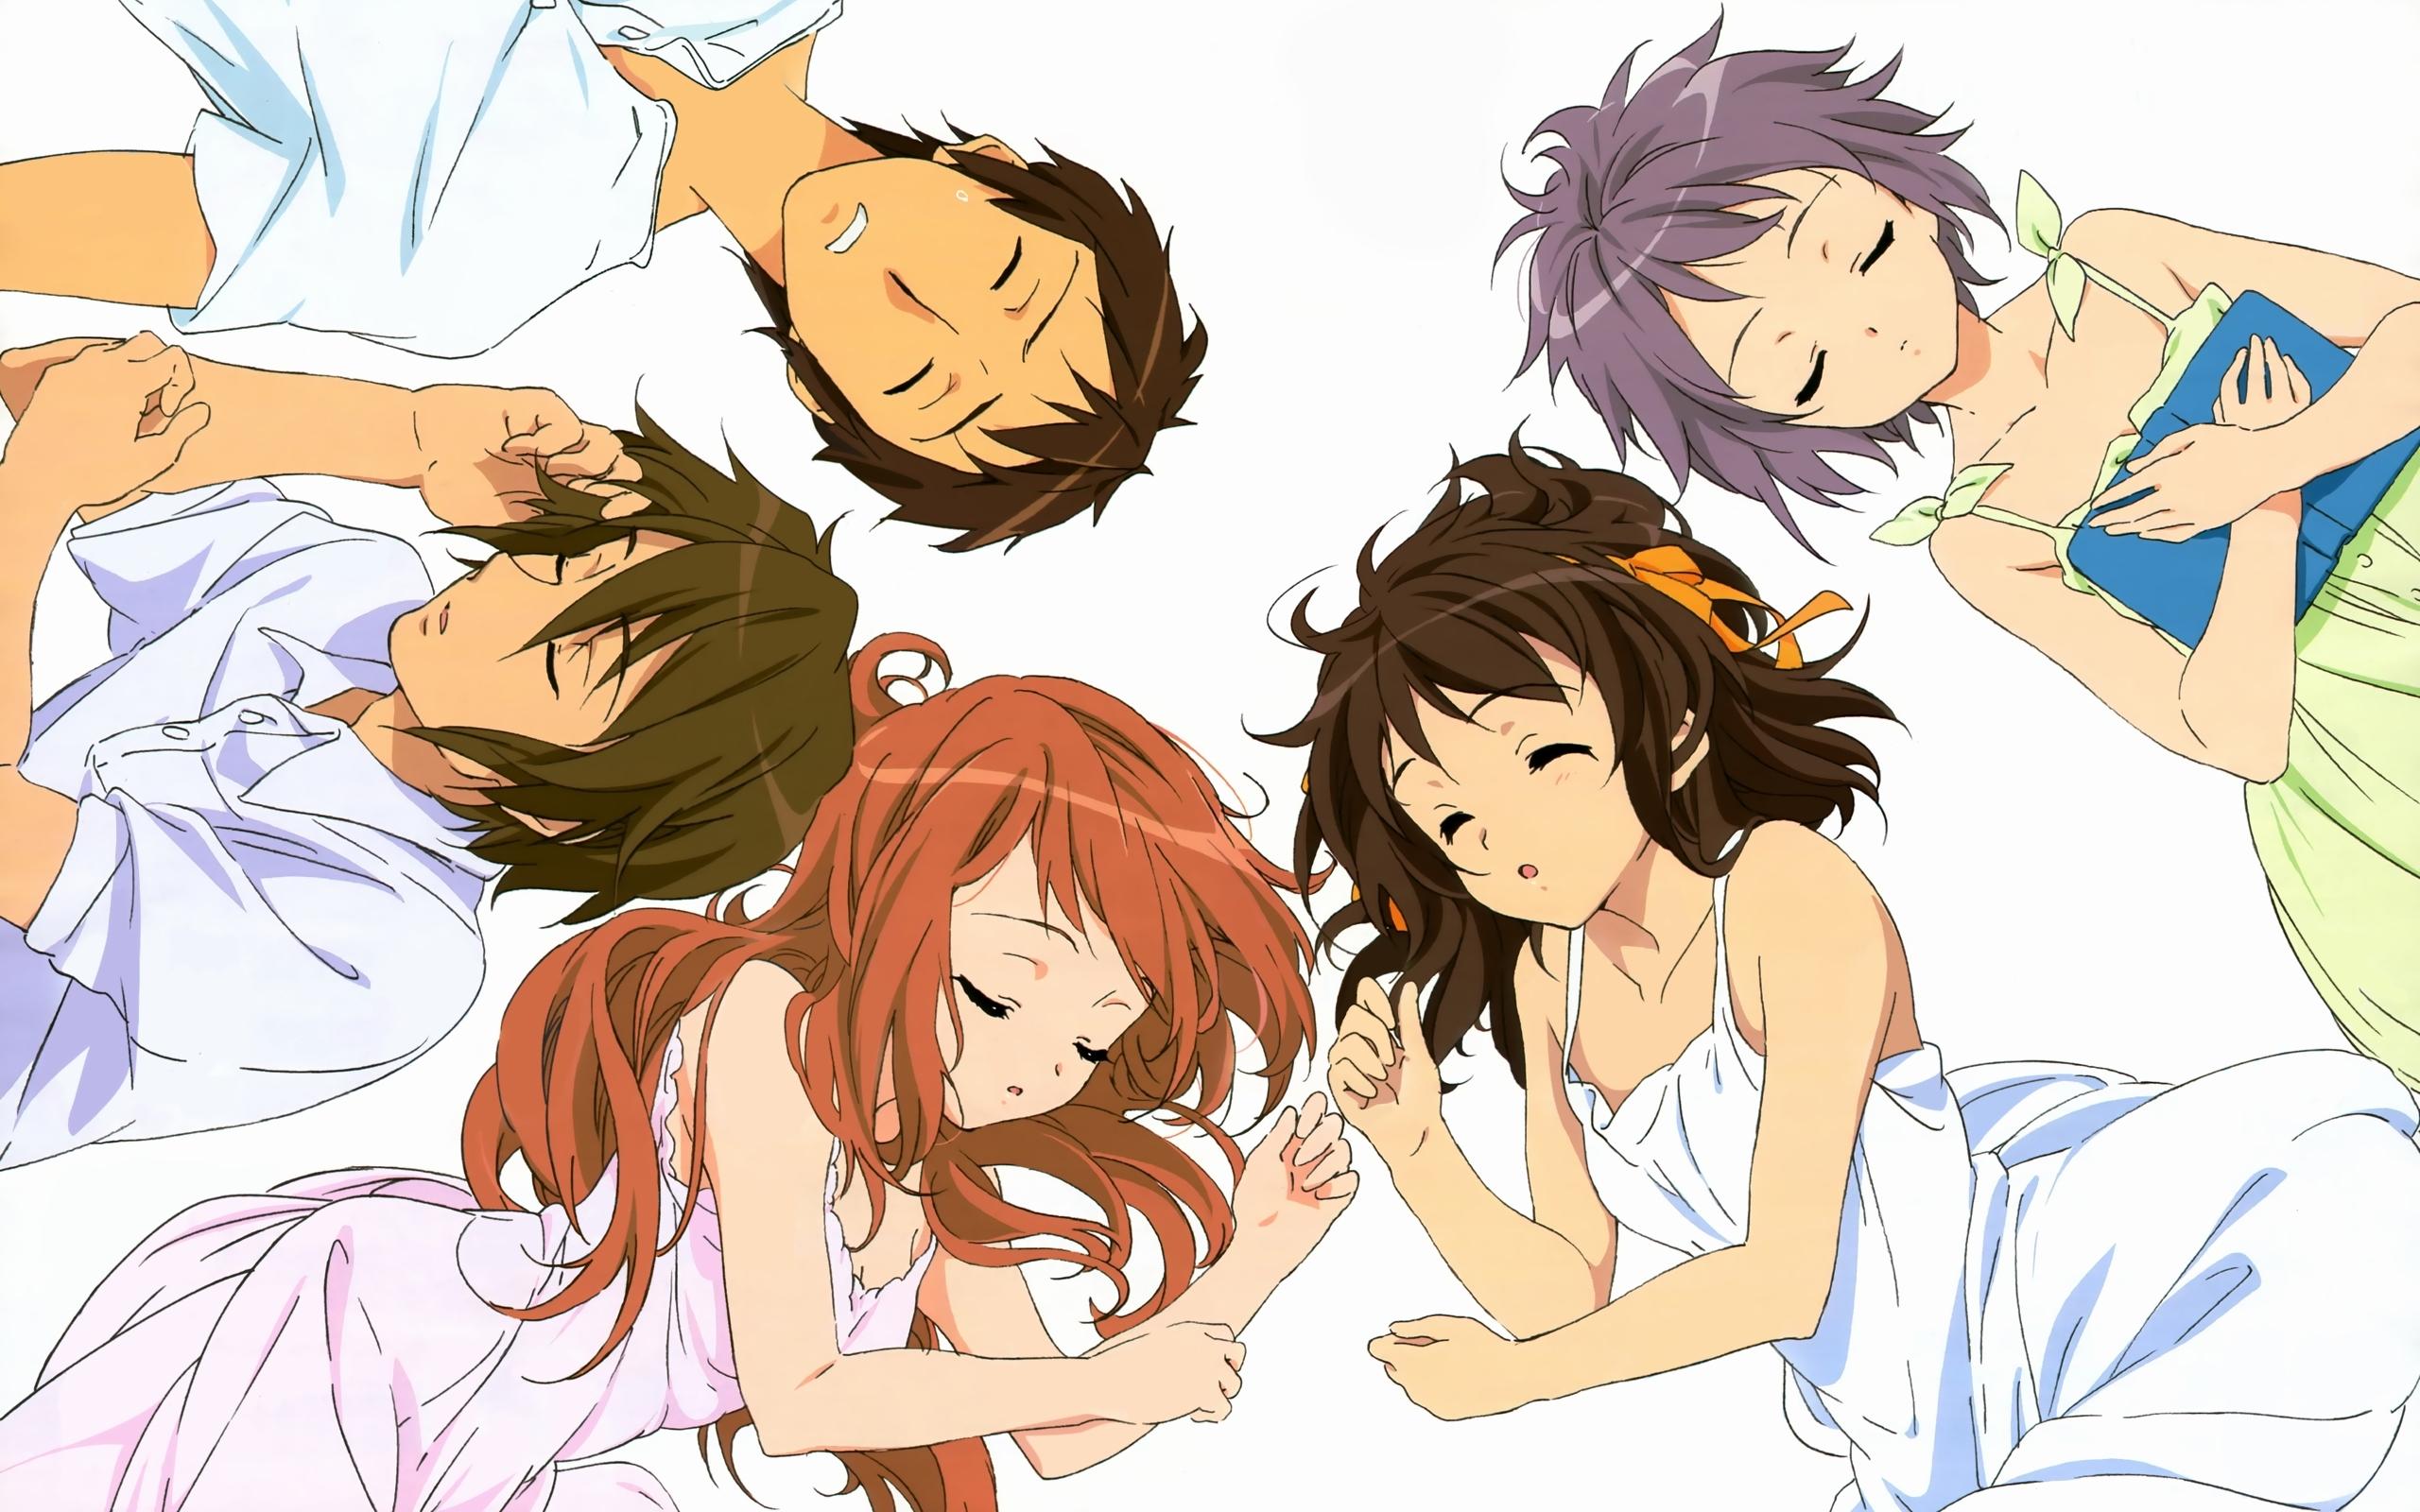 Wallpaper Anime Crowd Sleep Bed Top View 2560x1600 Wallpaperup 1093551 Hd Wallpapers Wallhere